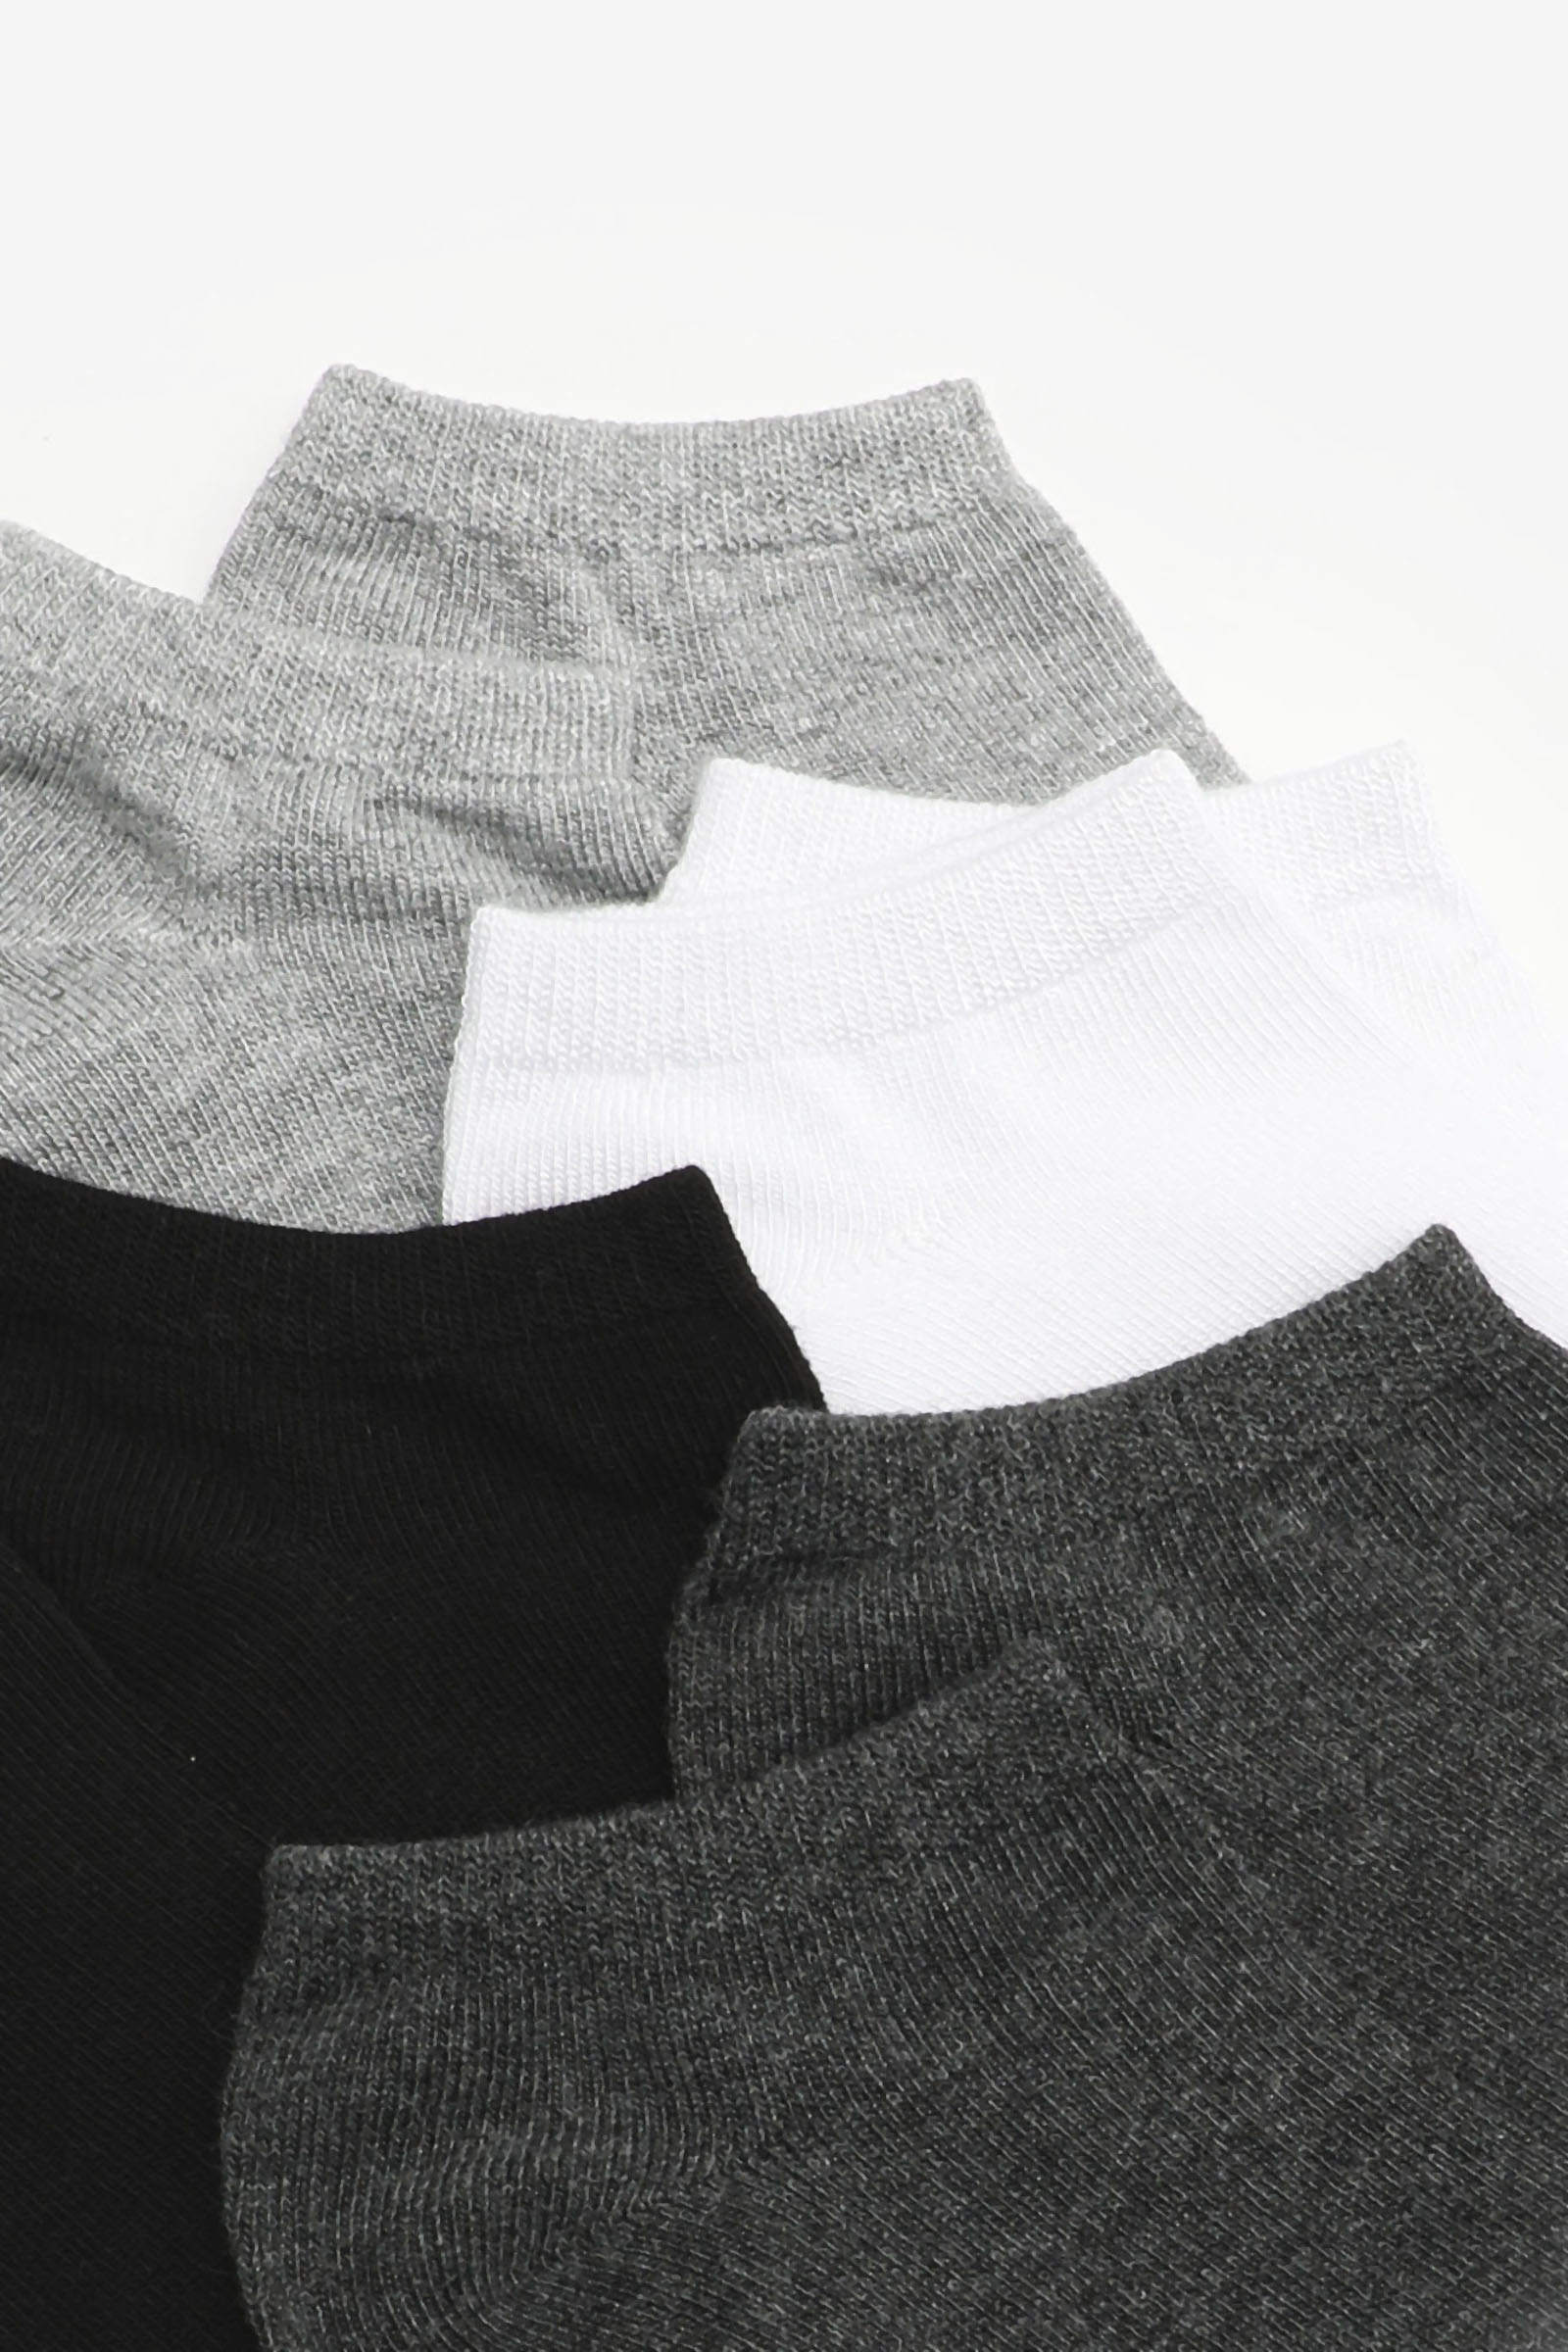 Pack of Bamboo Ankle Socks